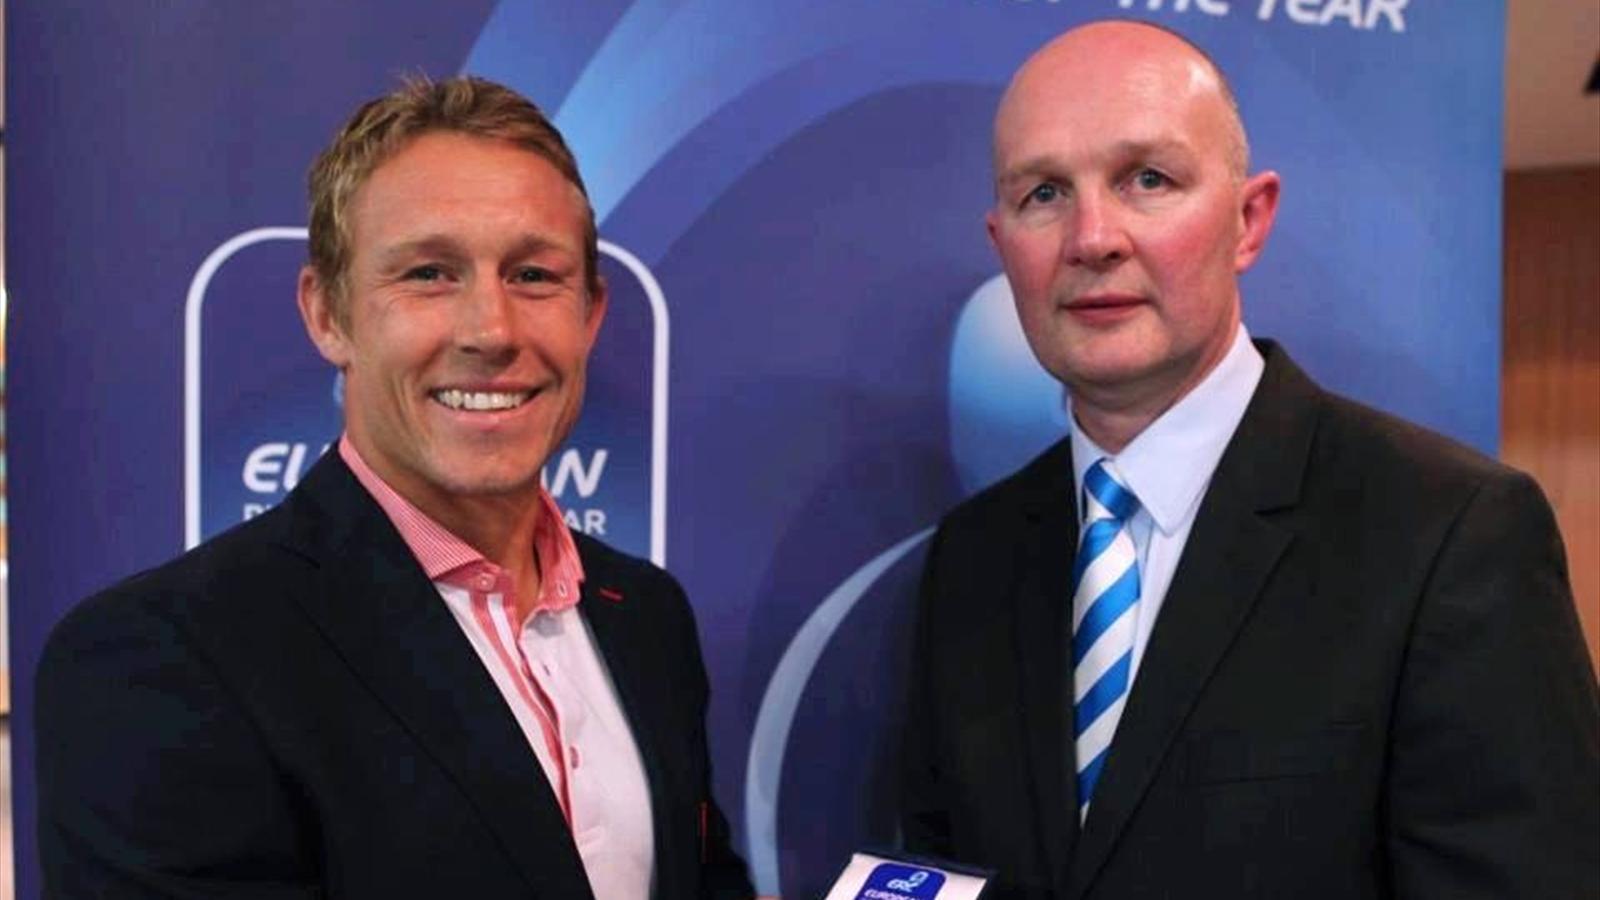 Jonny wilkinson lu meilleur joueur europ en de l 39 ann e coupe d 39 europe 2012 2013 rugby - Meilleur buteur en coupe d europe ...